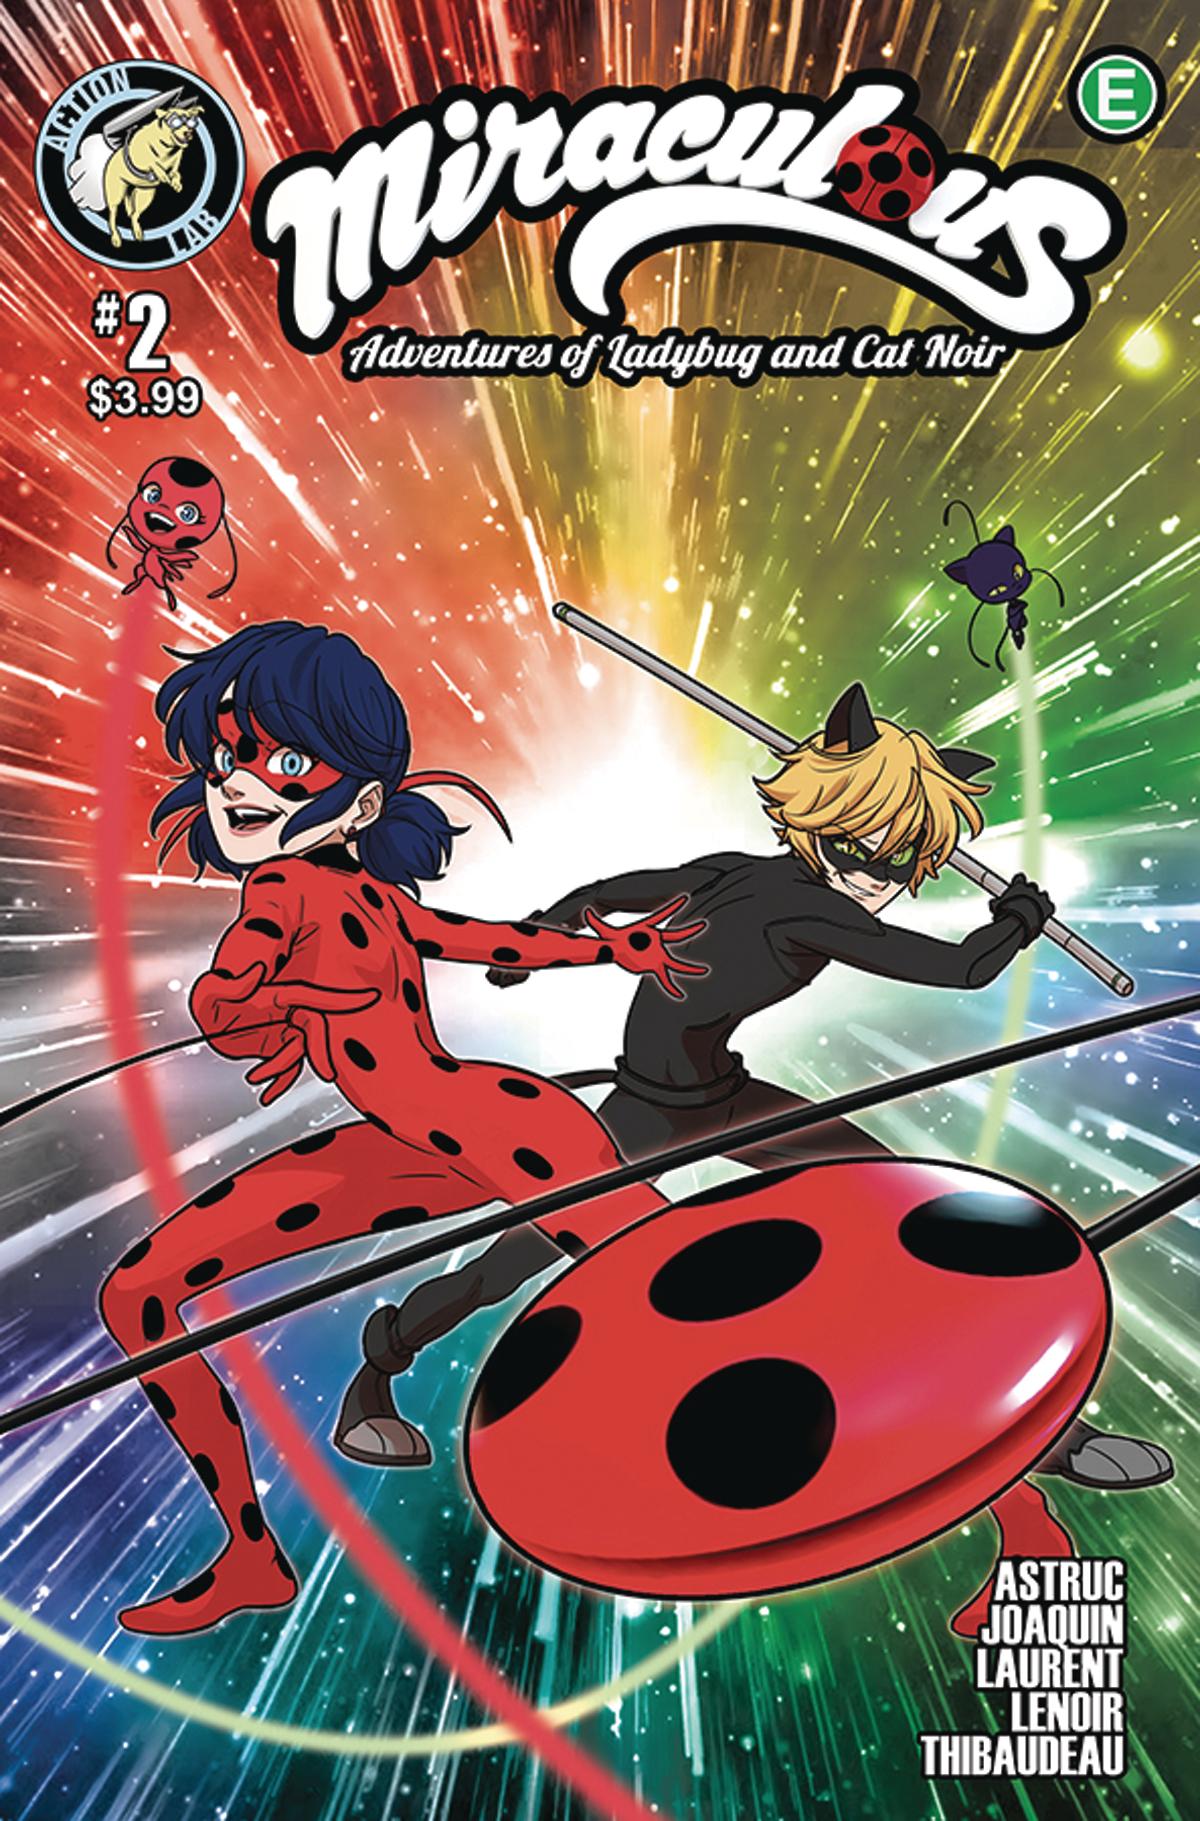 miraculous tales of ladybug & cat noir episode guide